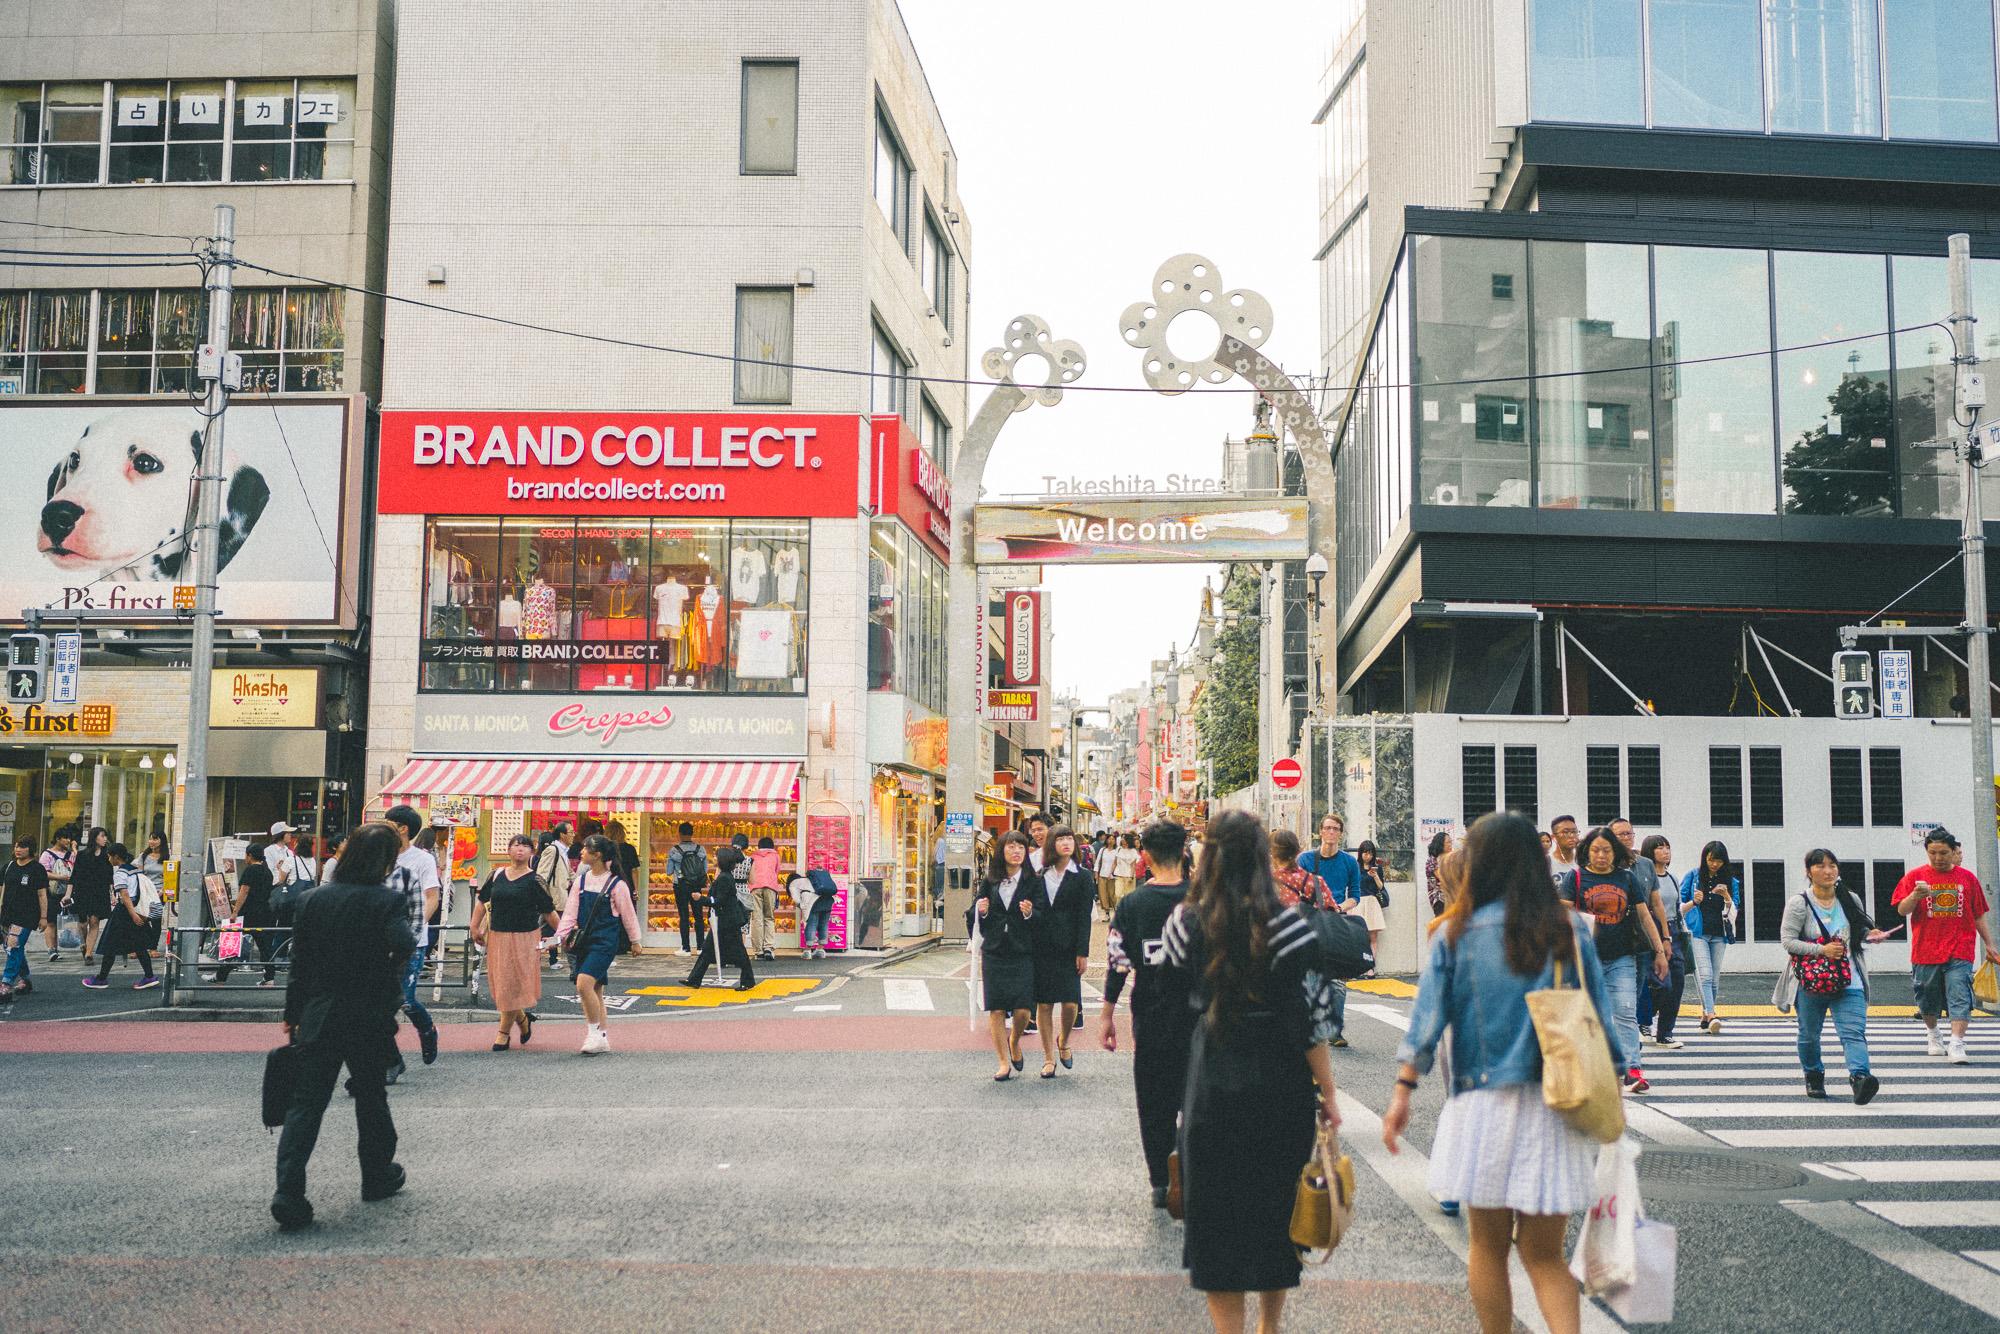 The Complete Tokyo Travel Guide | City Guides | Japan Travel Itinerary | Shinjuku Shibuya Harajuku Neighborhood Travel Tips